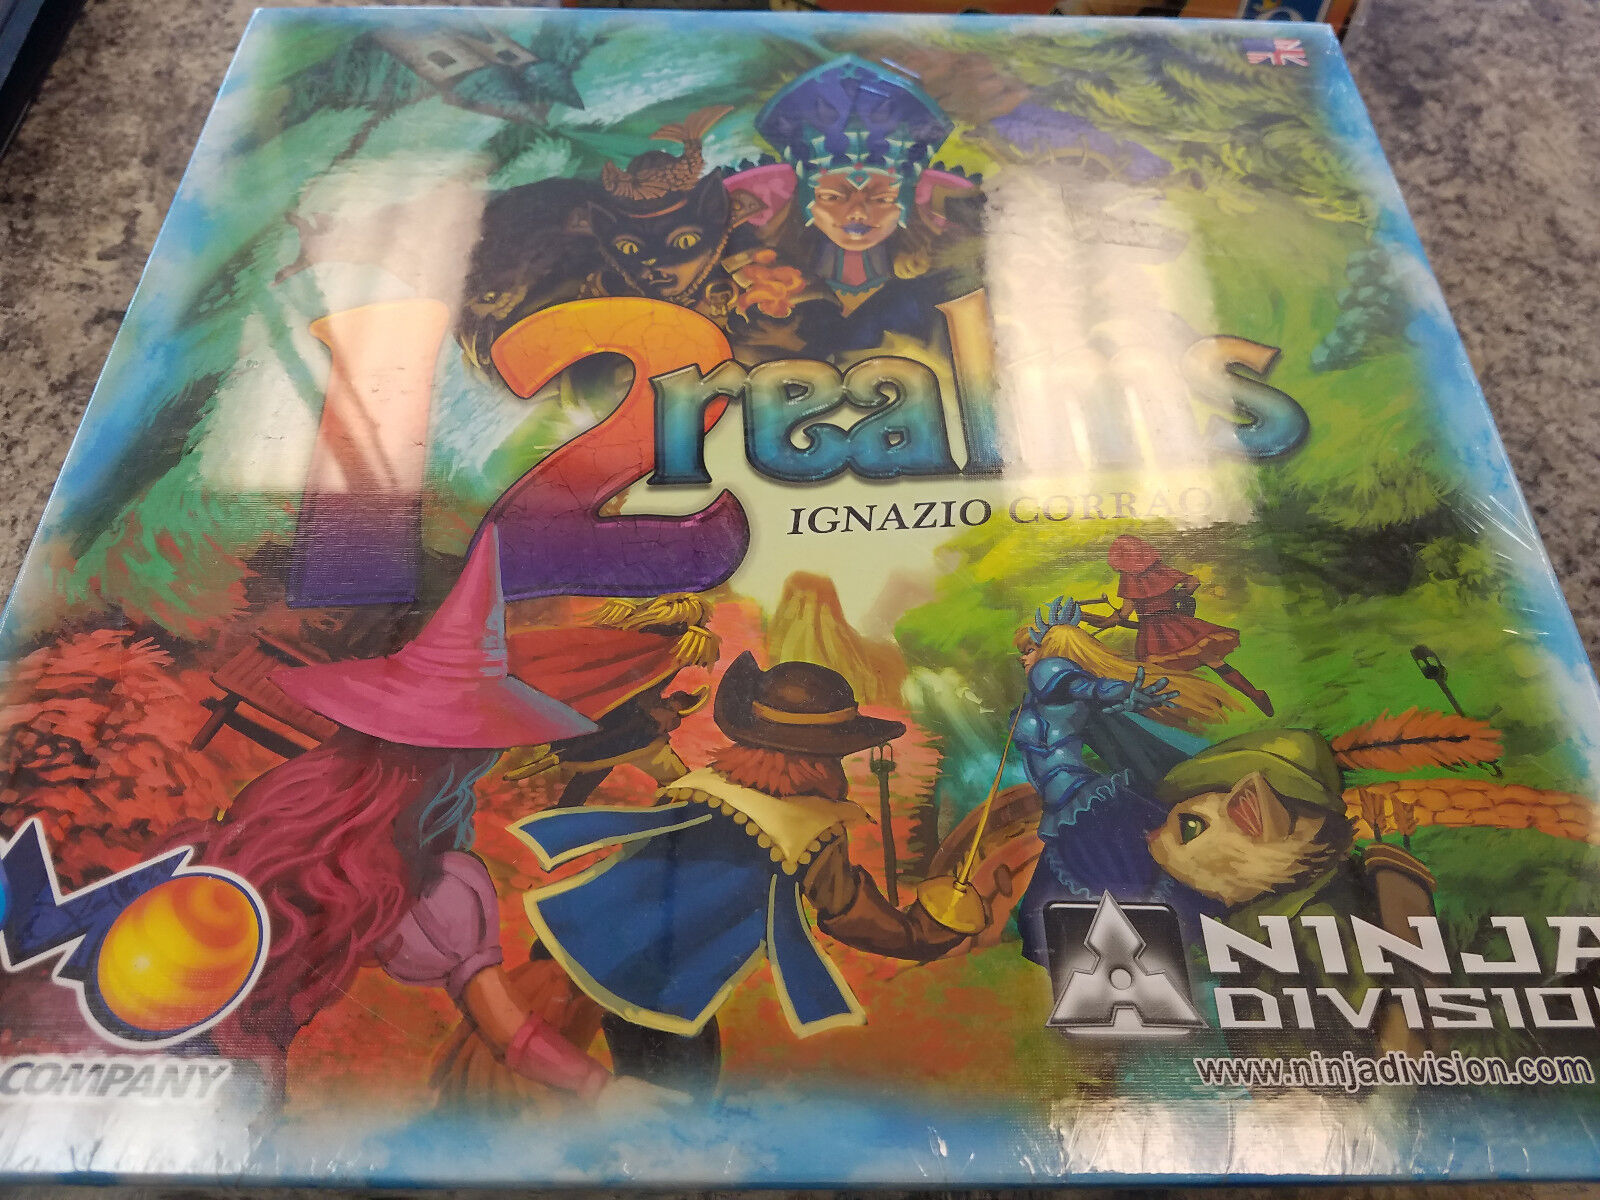 12  Realms - Ninja Division giocos tavola gioco nuovo   sport caldi